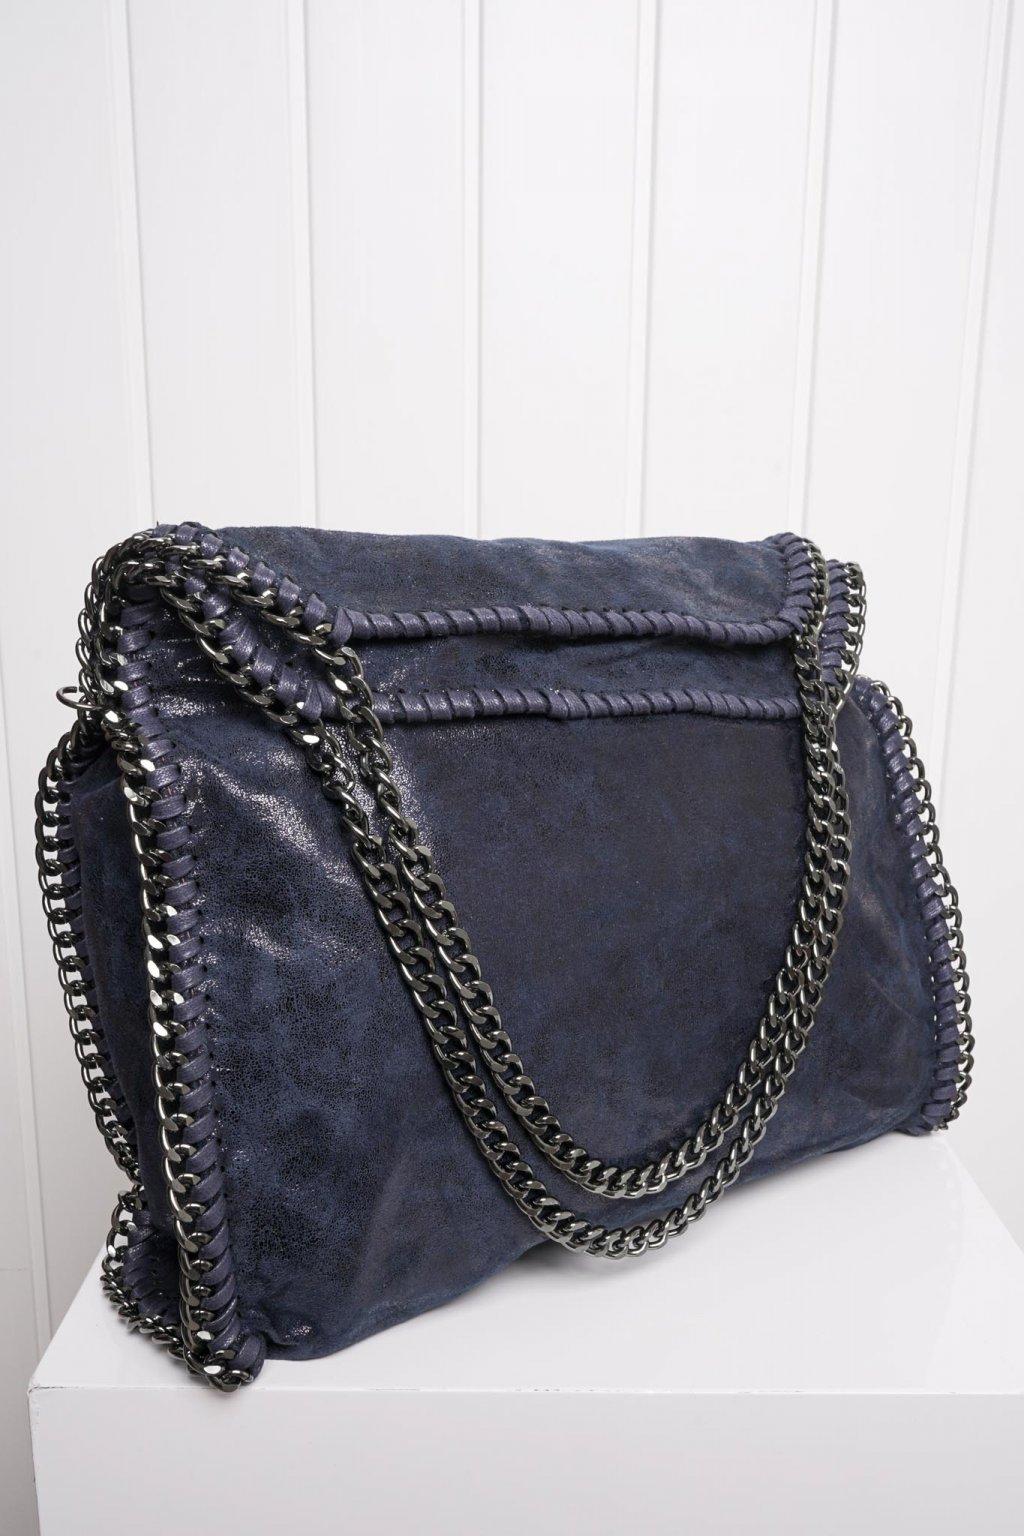 Kabelka, ruksak, dobrá cena, čierna kabelka, čierny ruksak, basic, kabelky, ruksaky 066